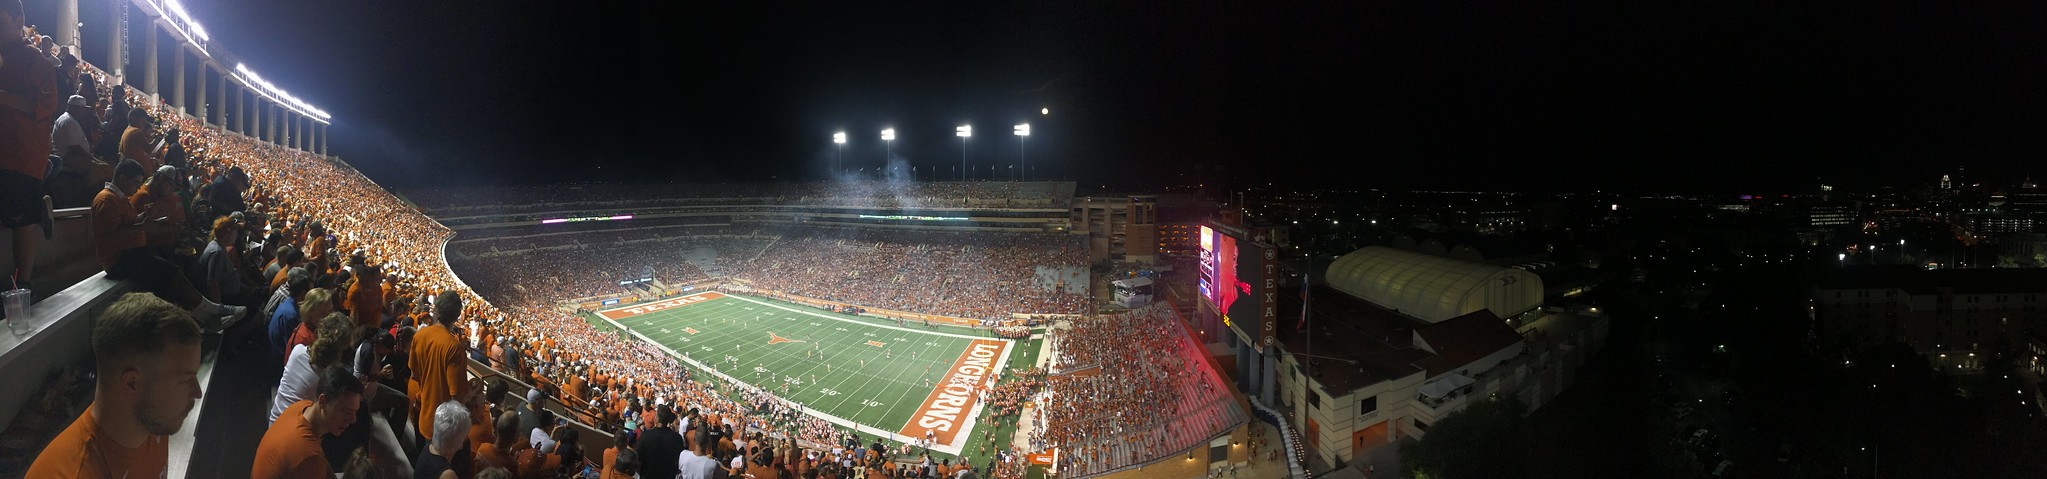 Panorama of Darrell K Royal-Texas Memorial Stadium